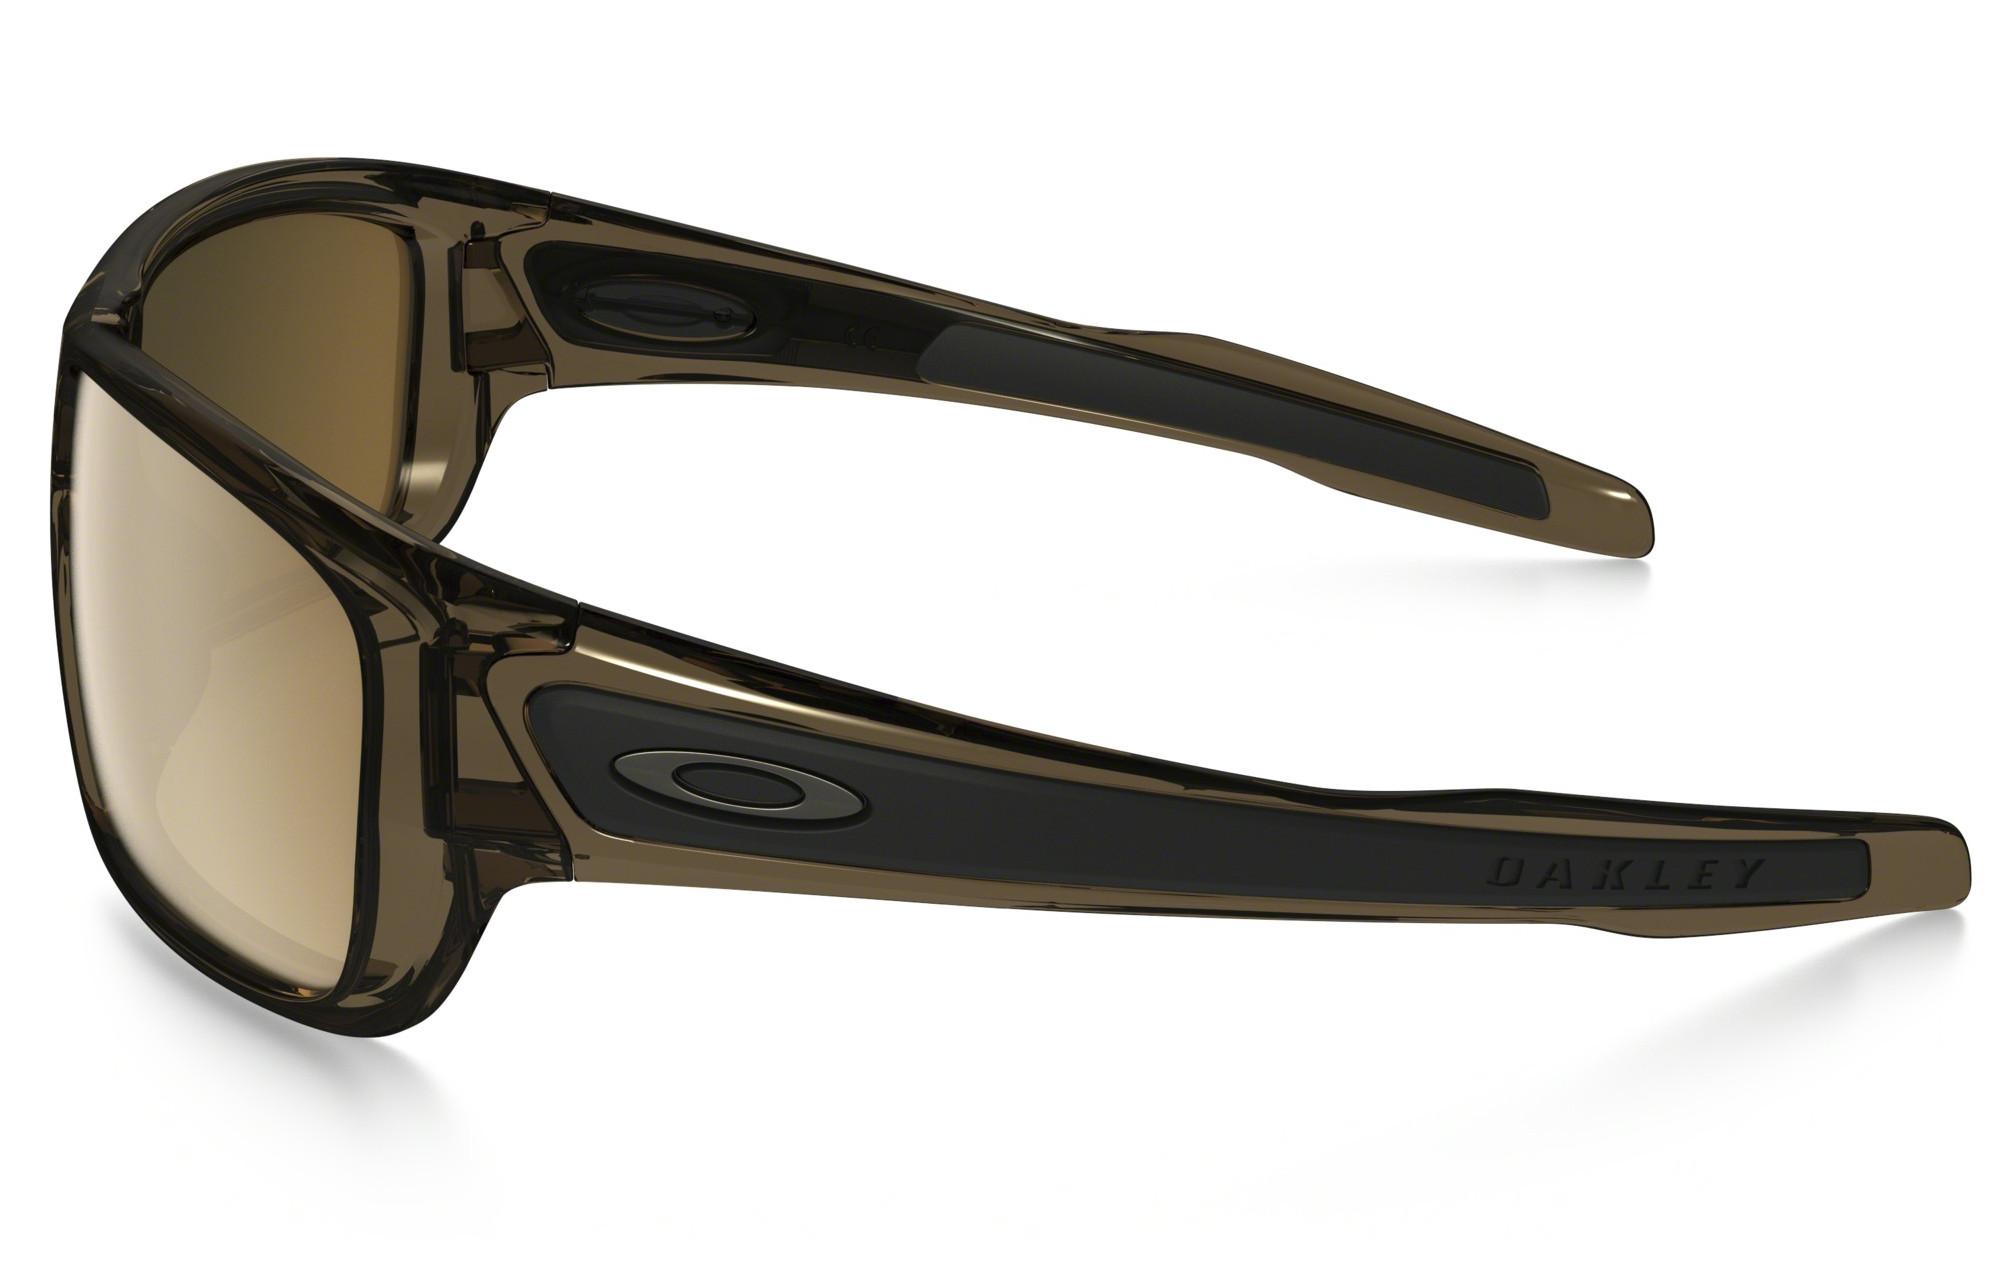 15fbab4caa7 OAKLEY TURBINE Sunglasses Brown - Brown Ref OO9263-02